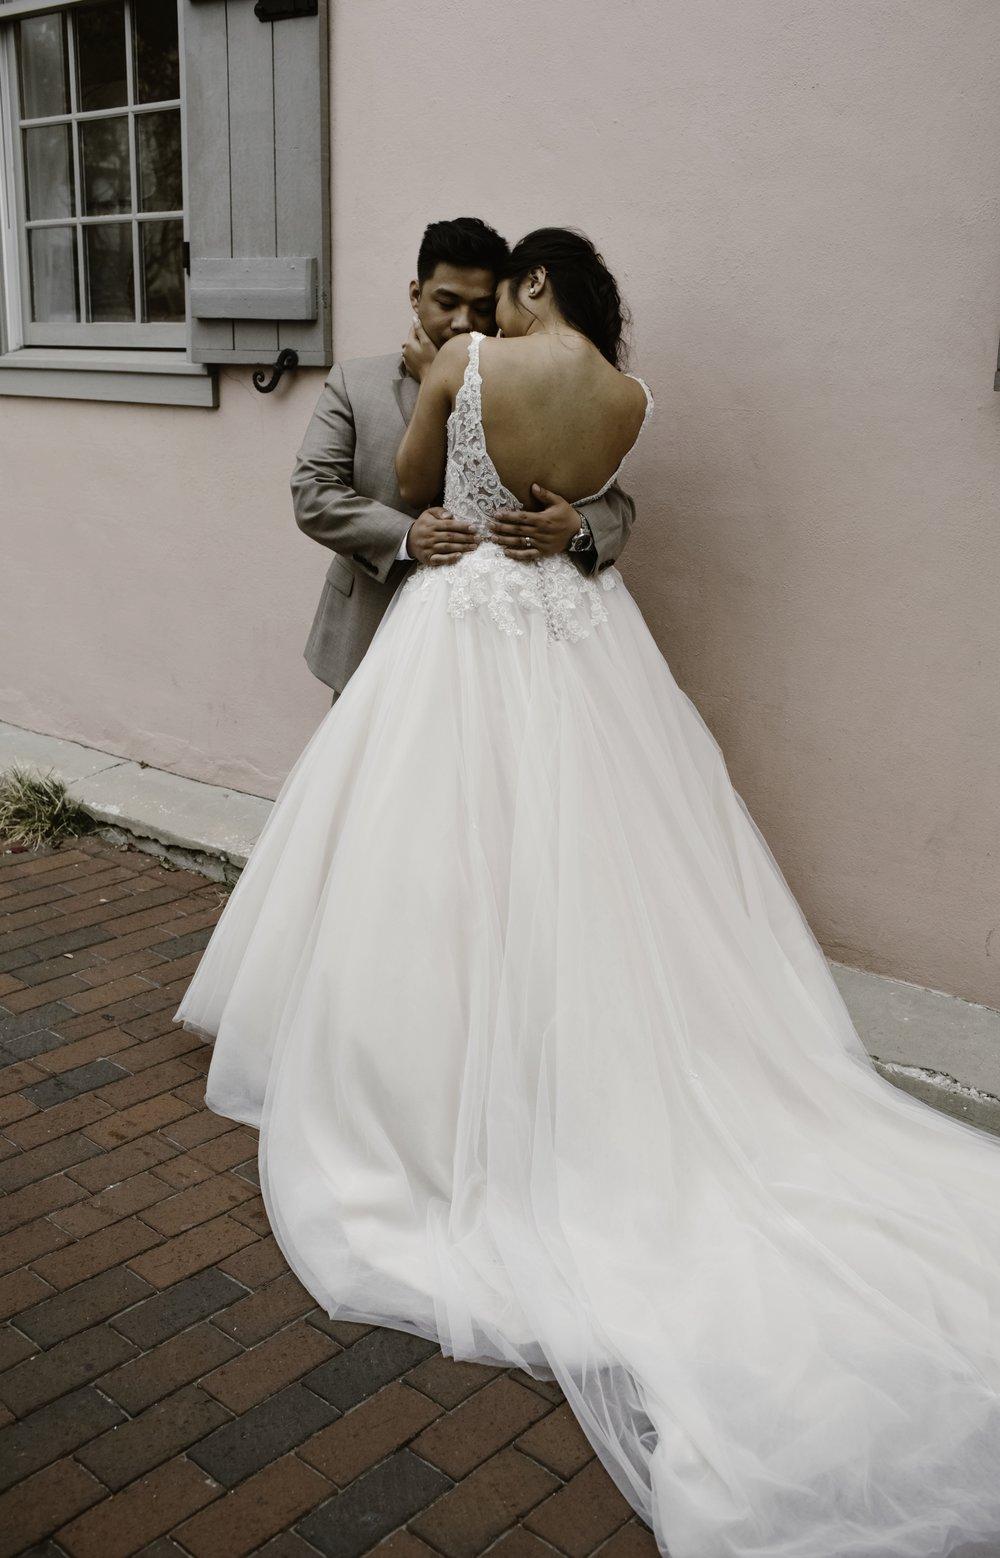 Wedding | St Augustine | Bay View at A1A aleworks| Roxanne and LJ | Vanessa Boy | Orlando Florida | Vanessa Boy | vanessaboy.com-154final.jpg